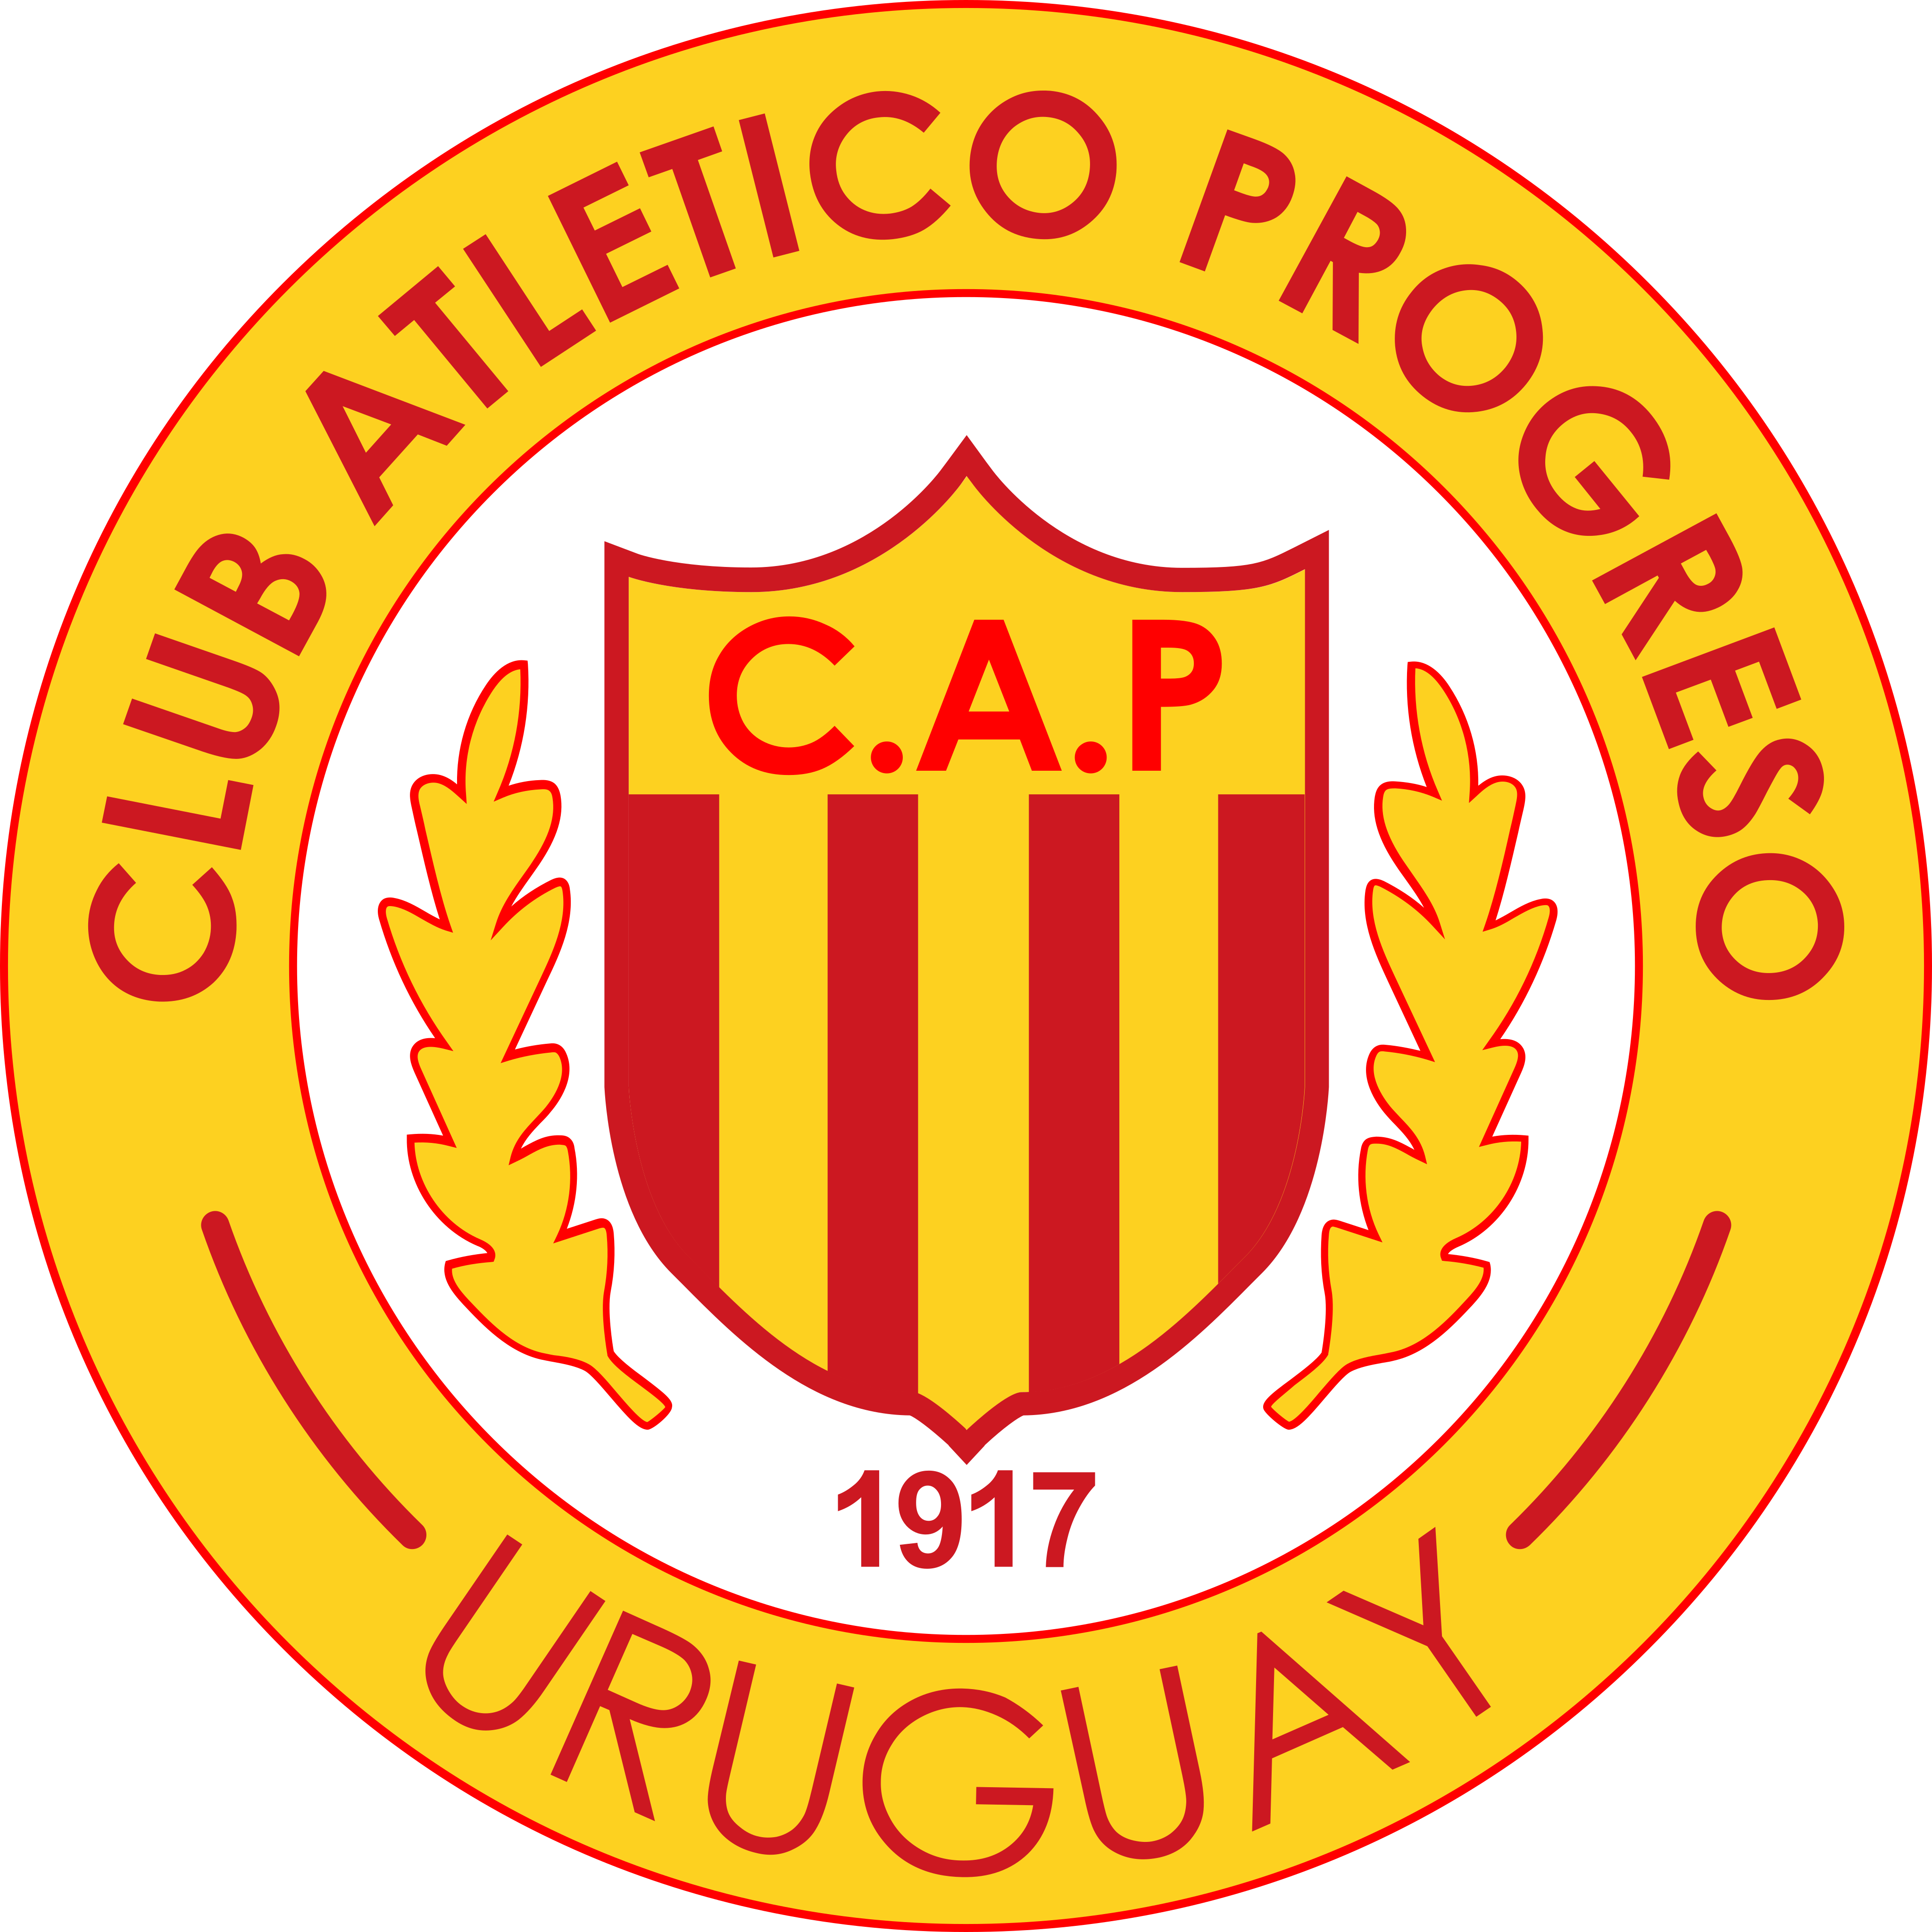 Club Atlético Progreso Logo Escudo.